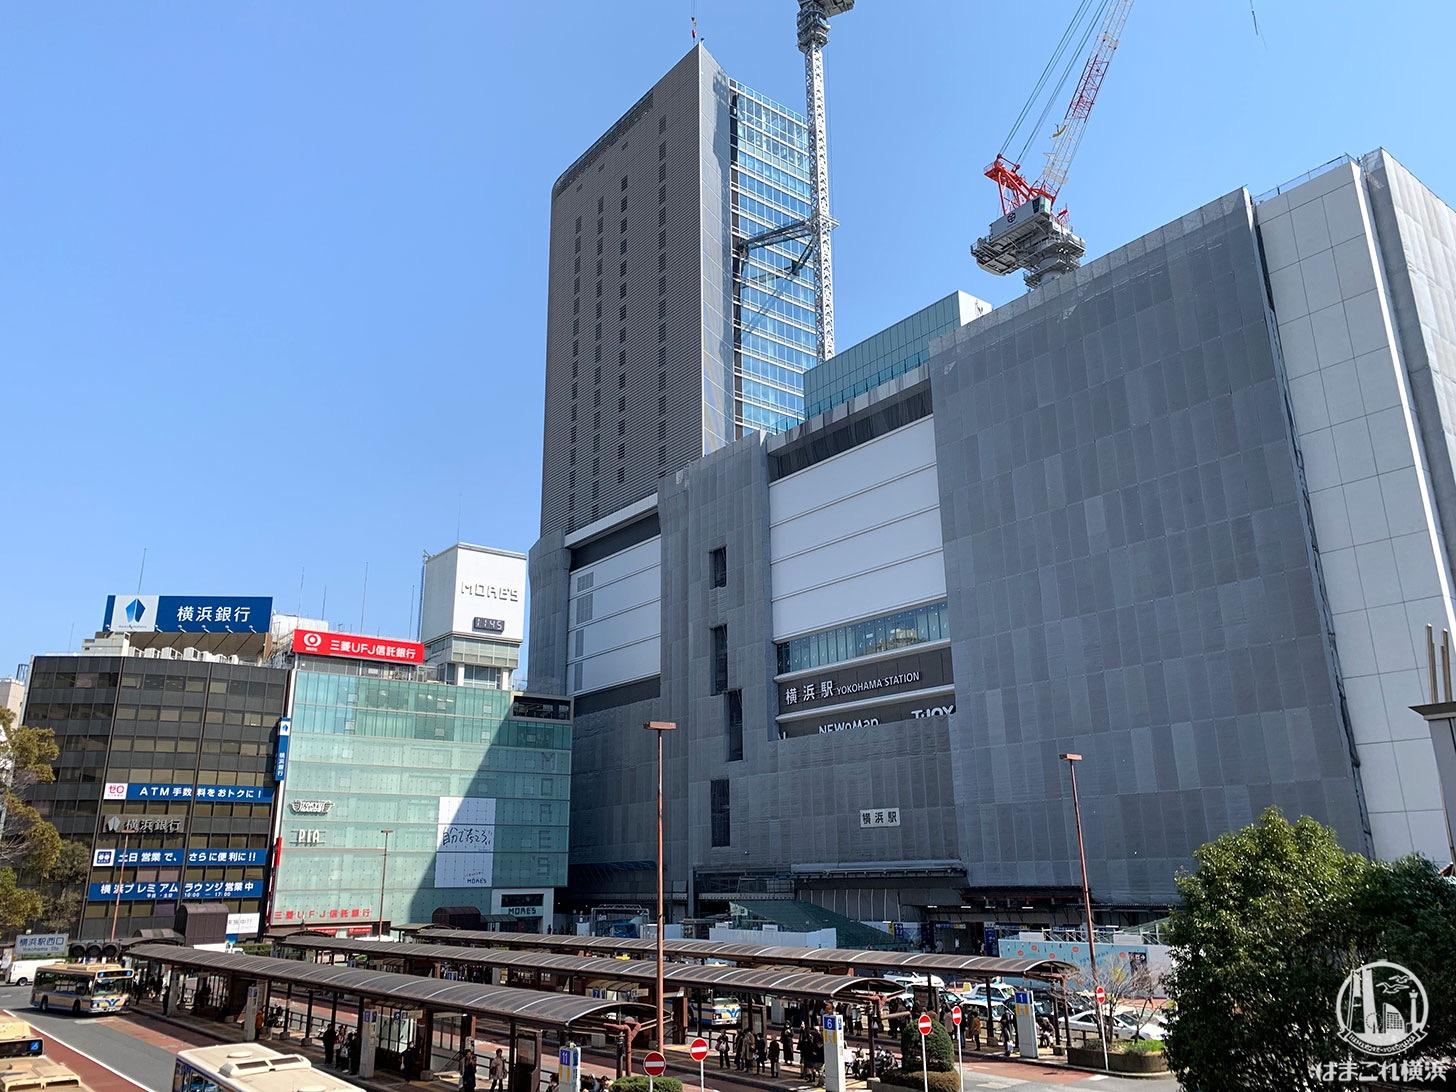 2019年3月 横浜駅西口の様子